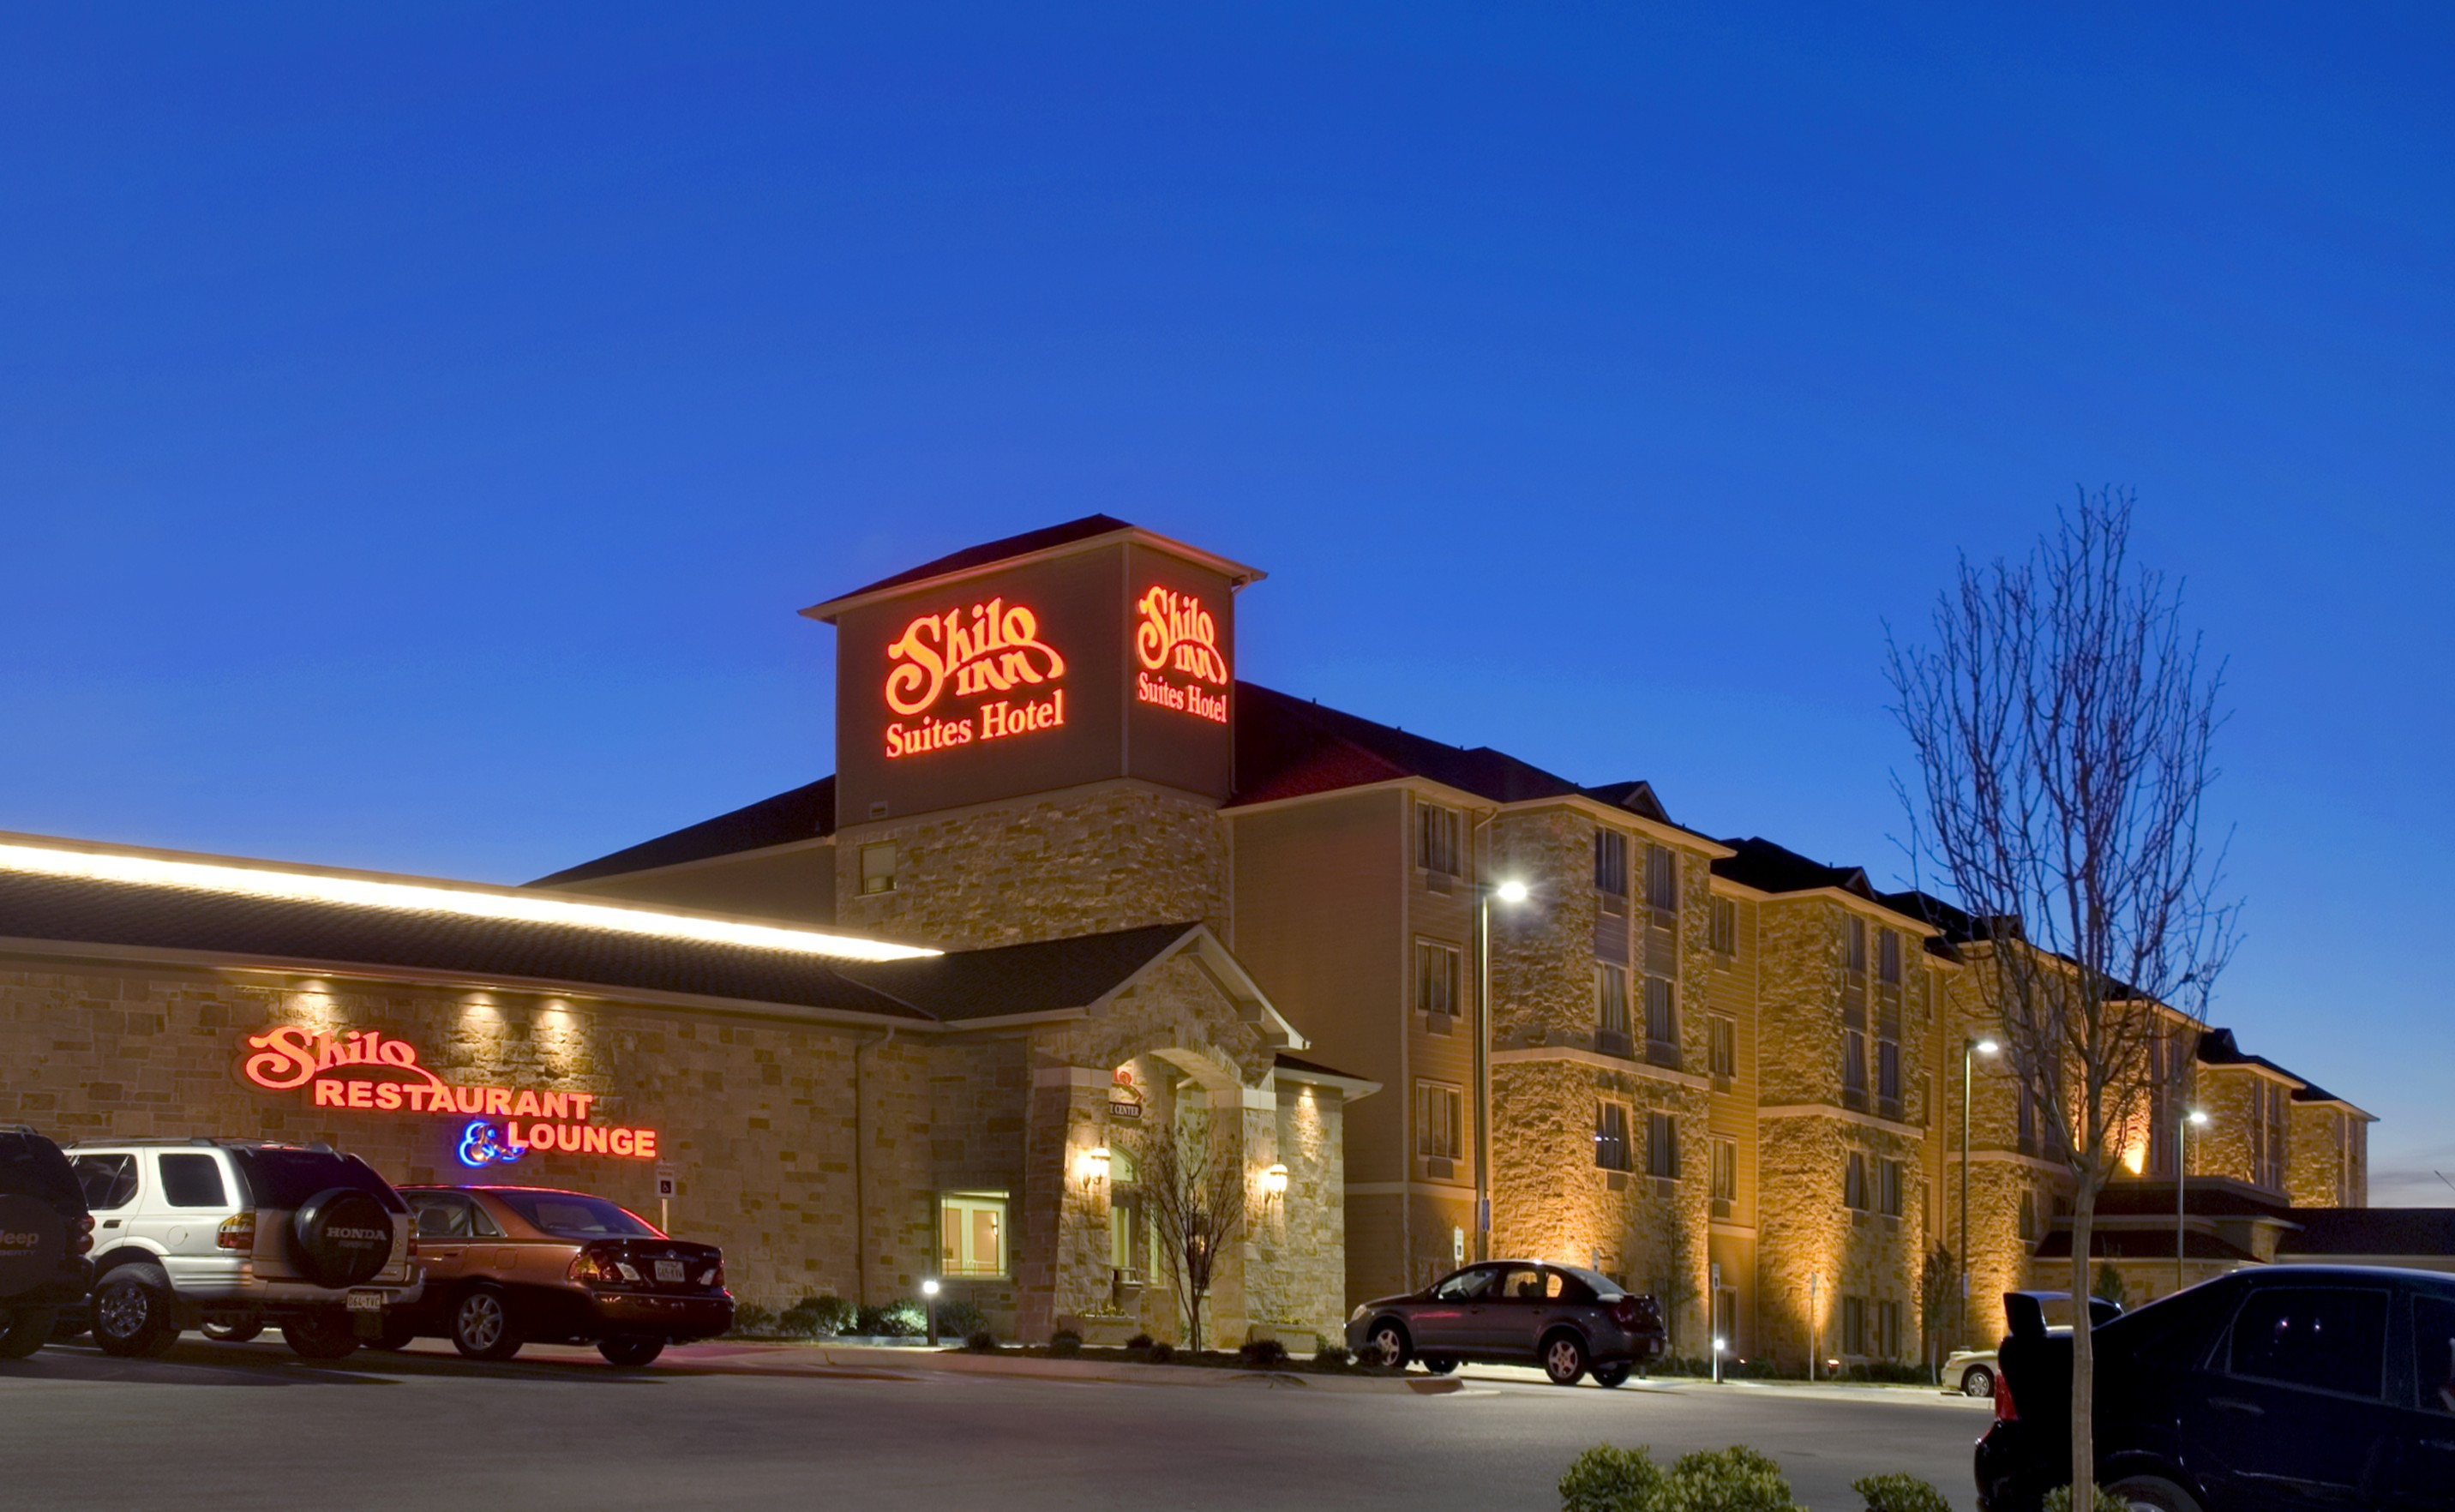 shilo inns suites hotels killeen texas. Black Bedroom Furniture Sets. Home Design Ideas